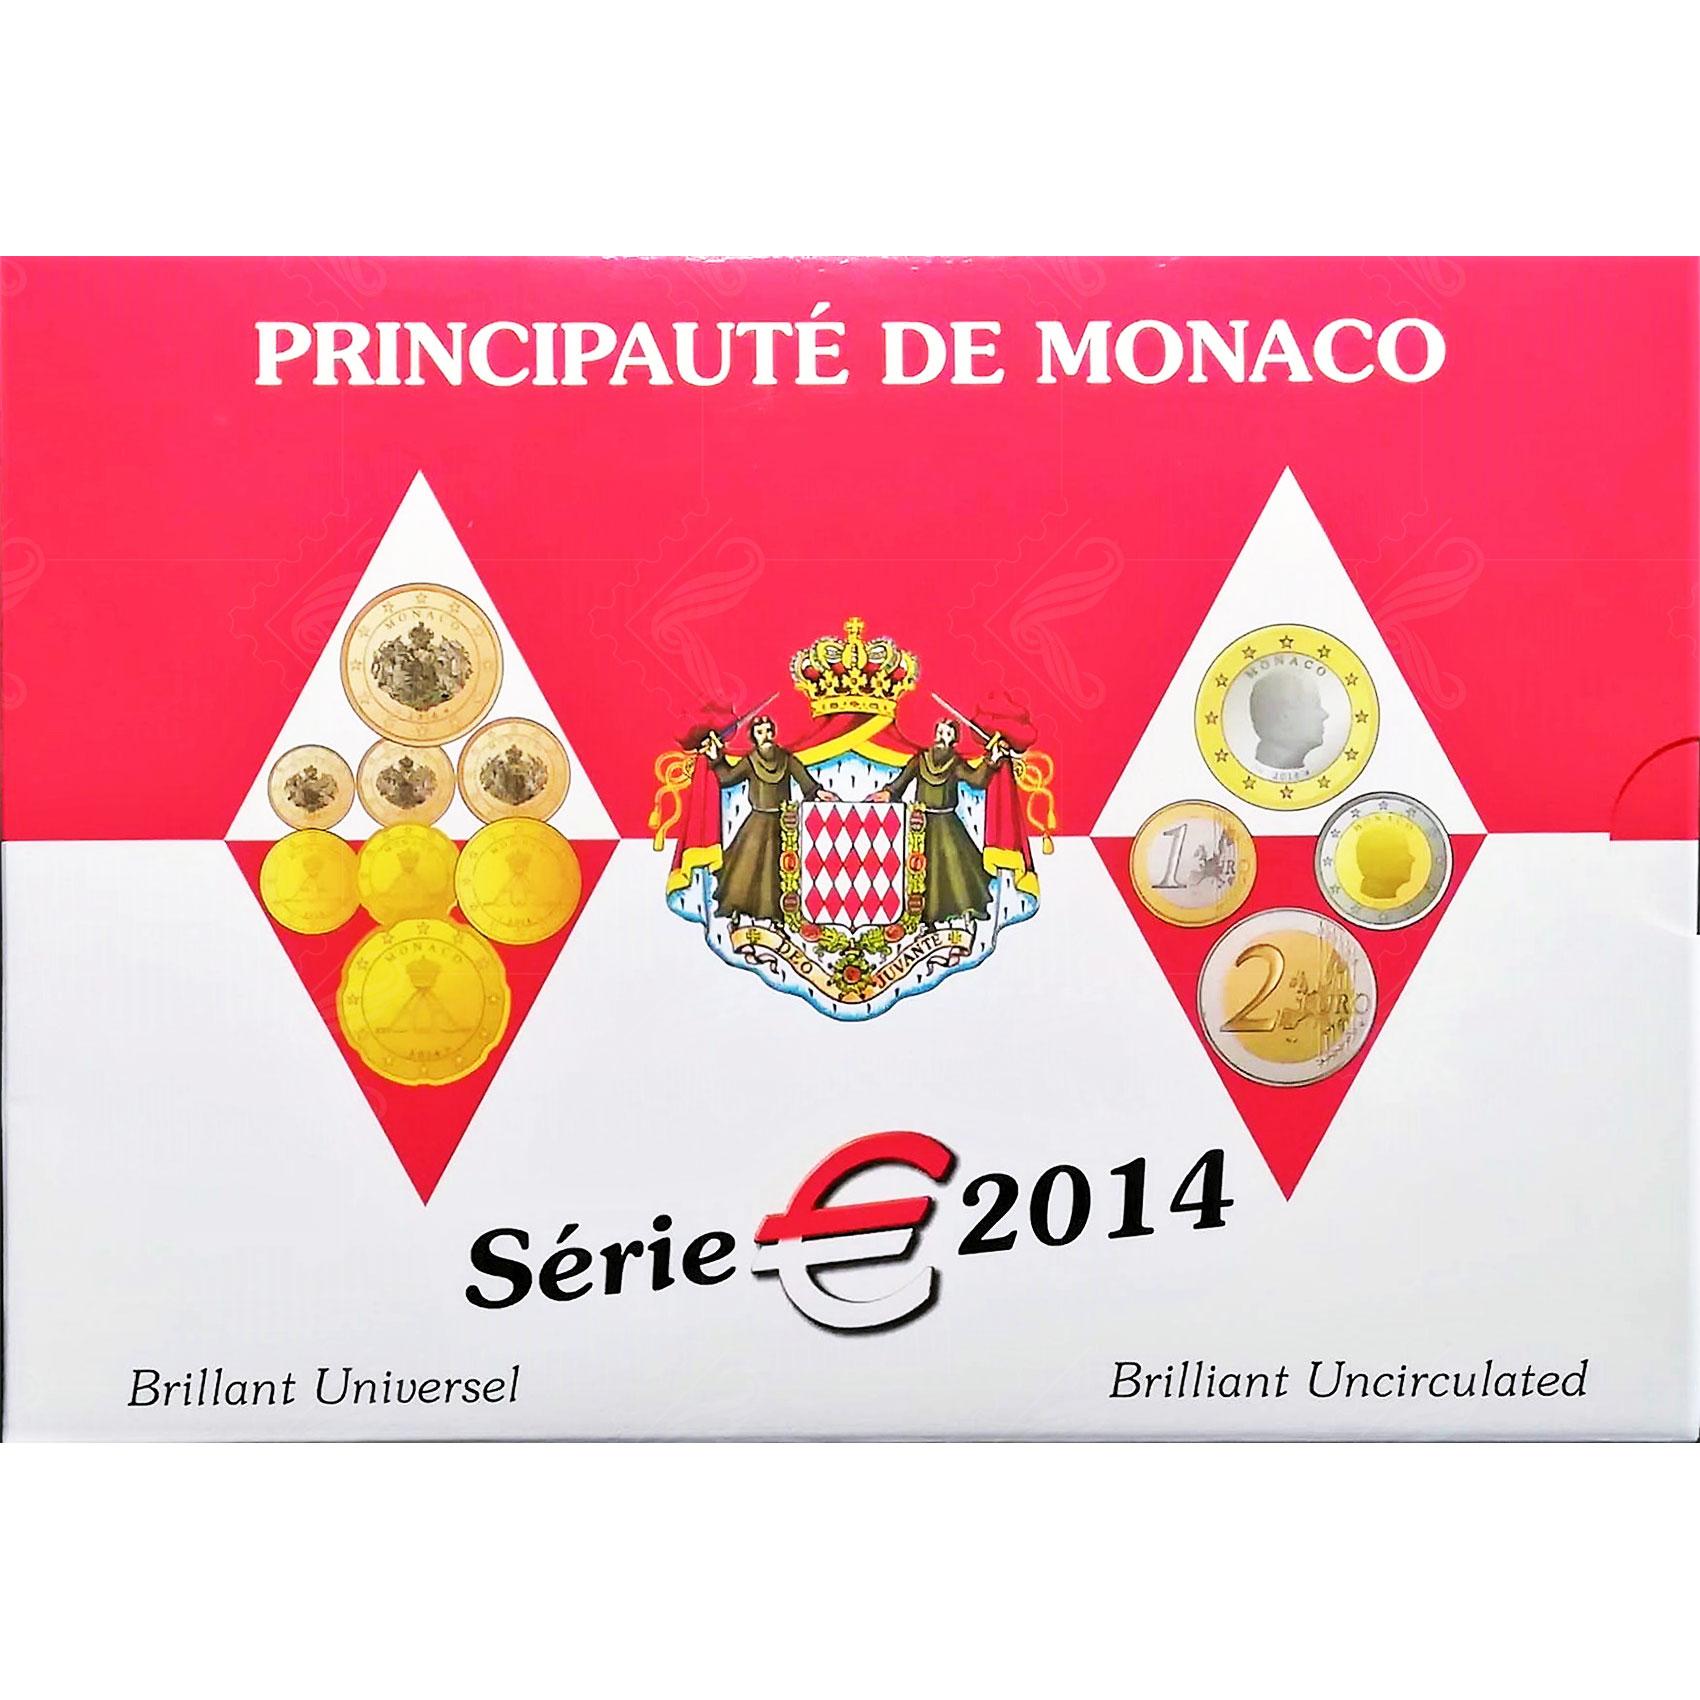 Divisionale Monaco 2014